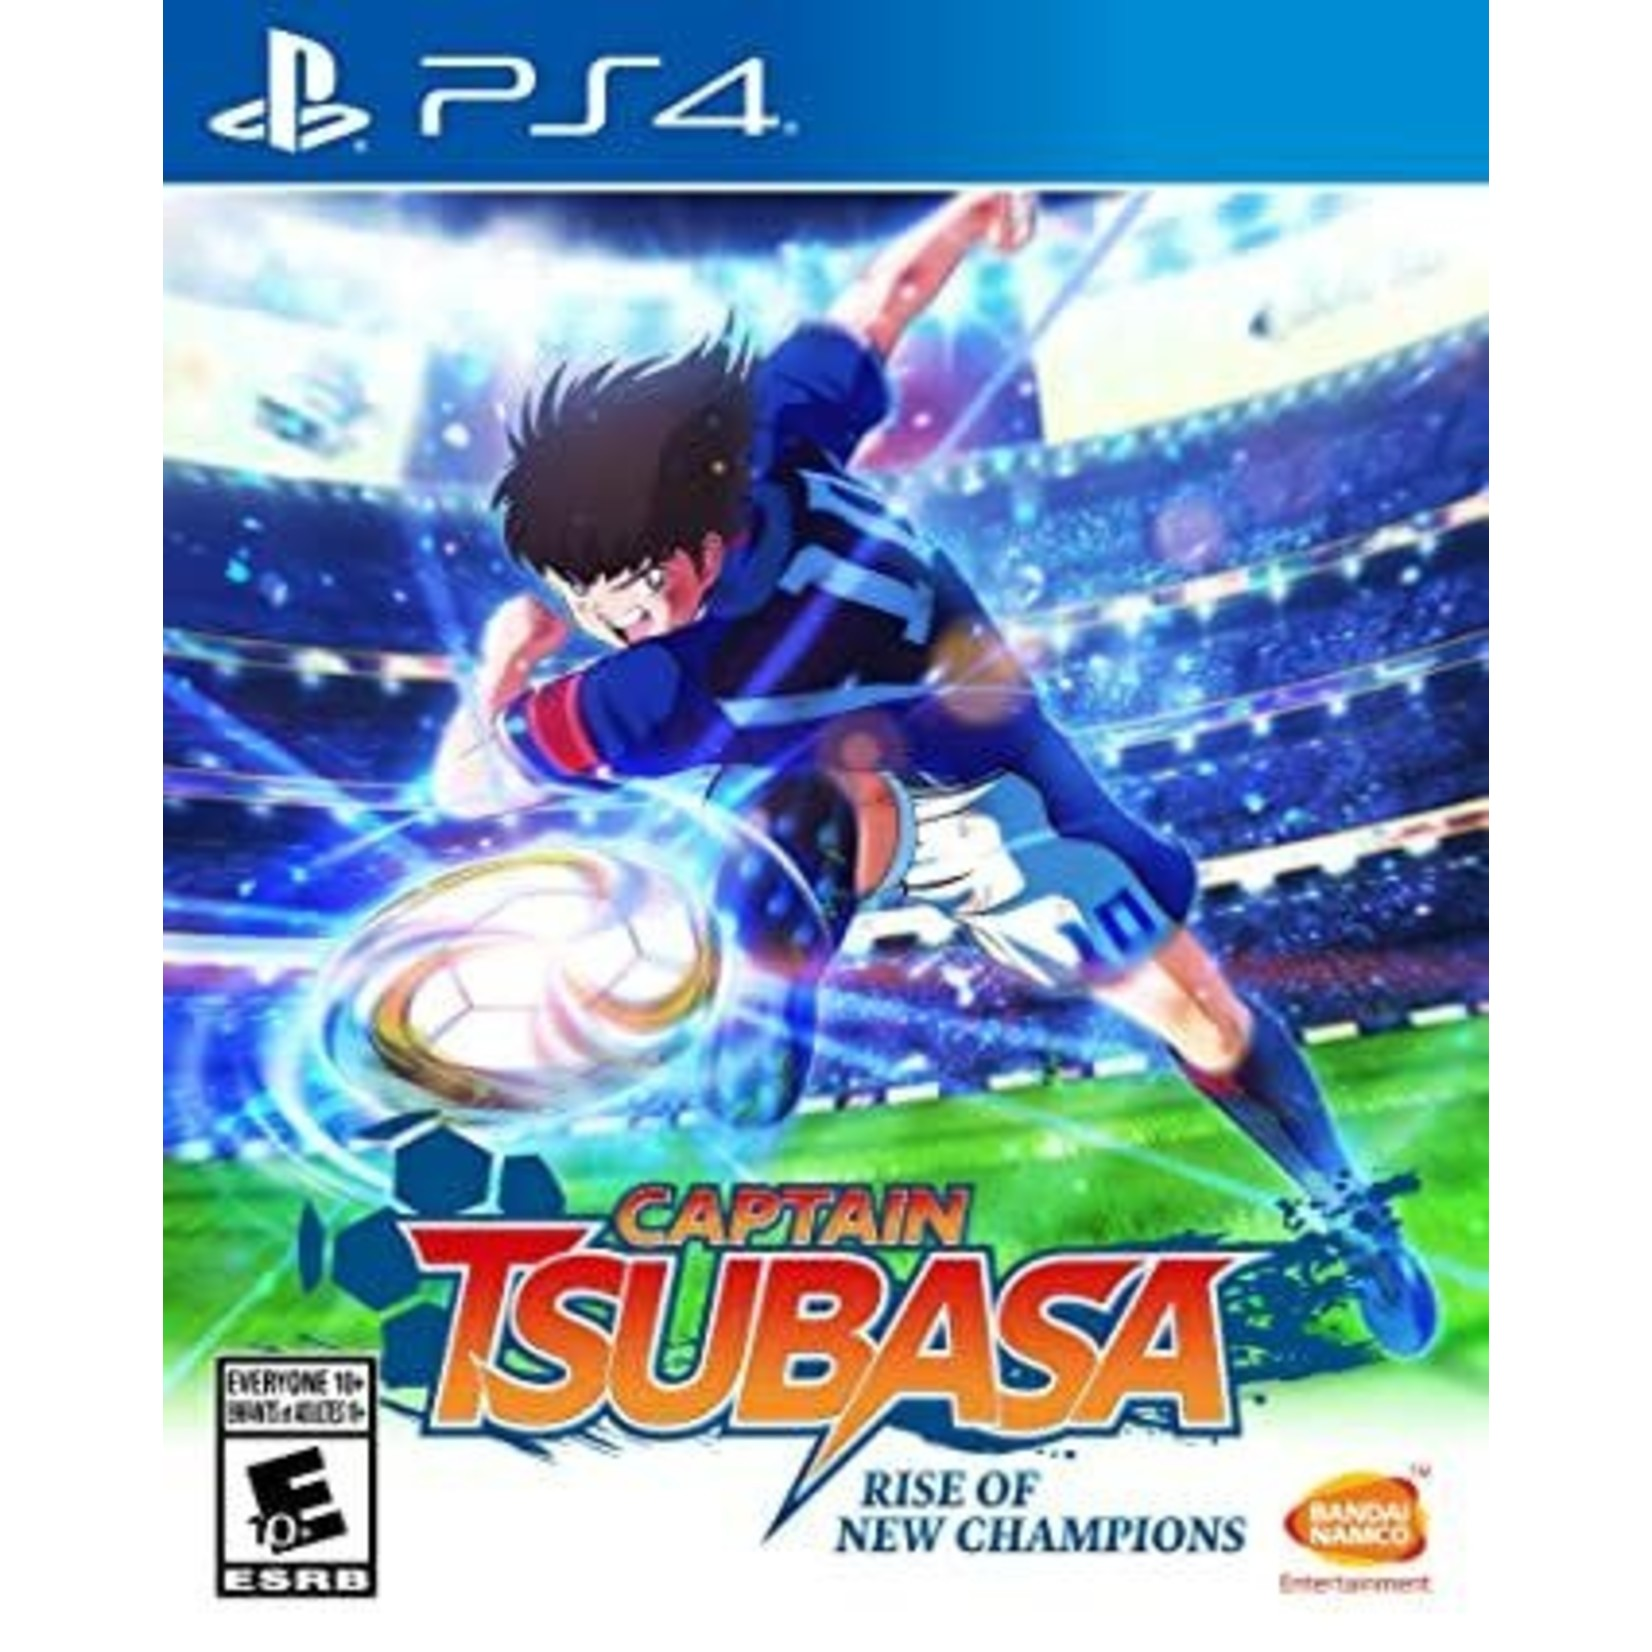 PS4U-Captain Tsubasa: Rise of New Champions